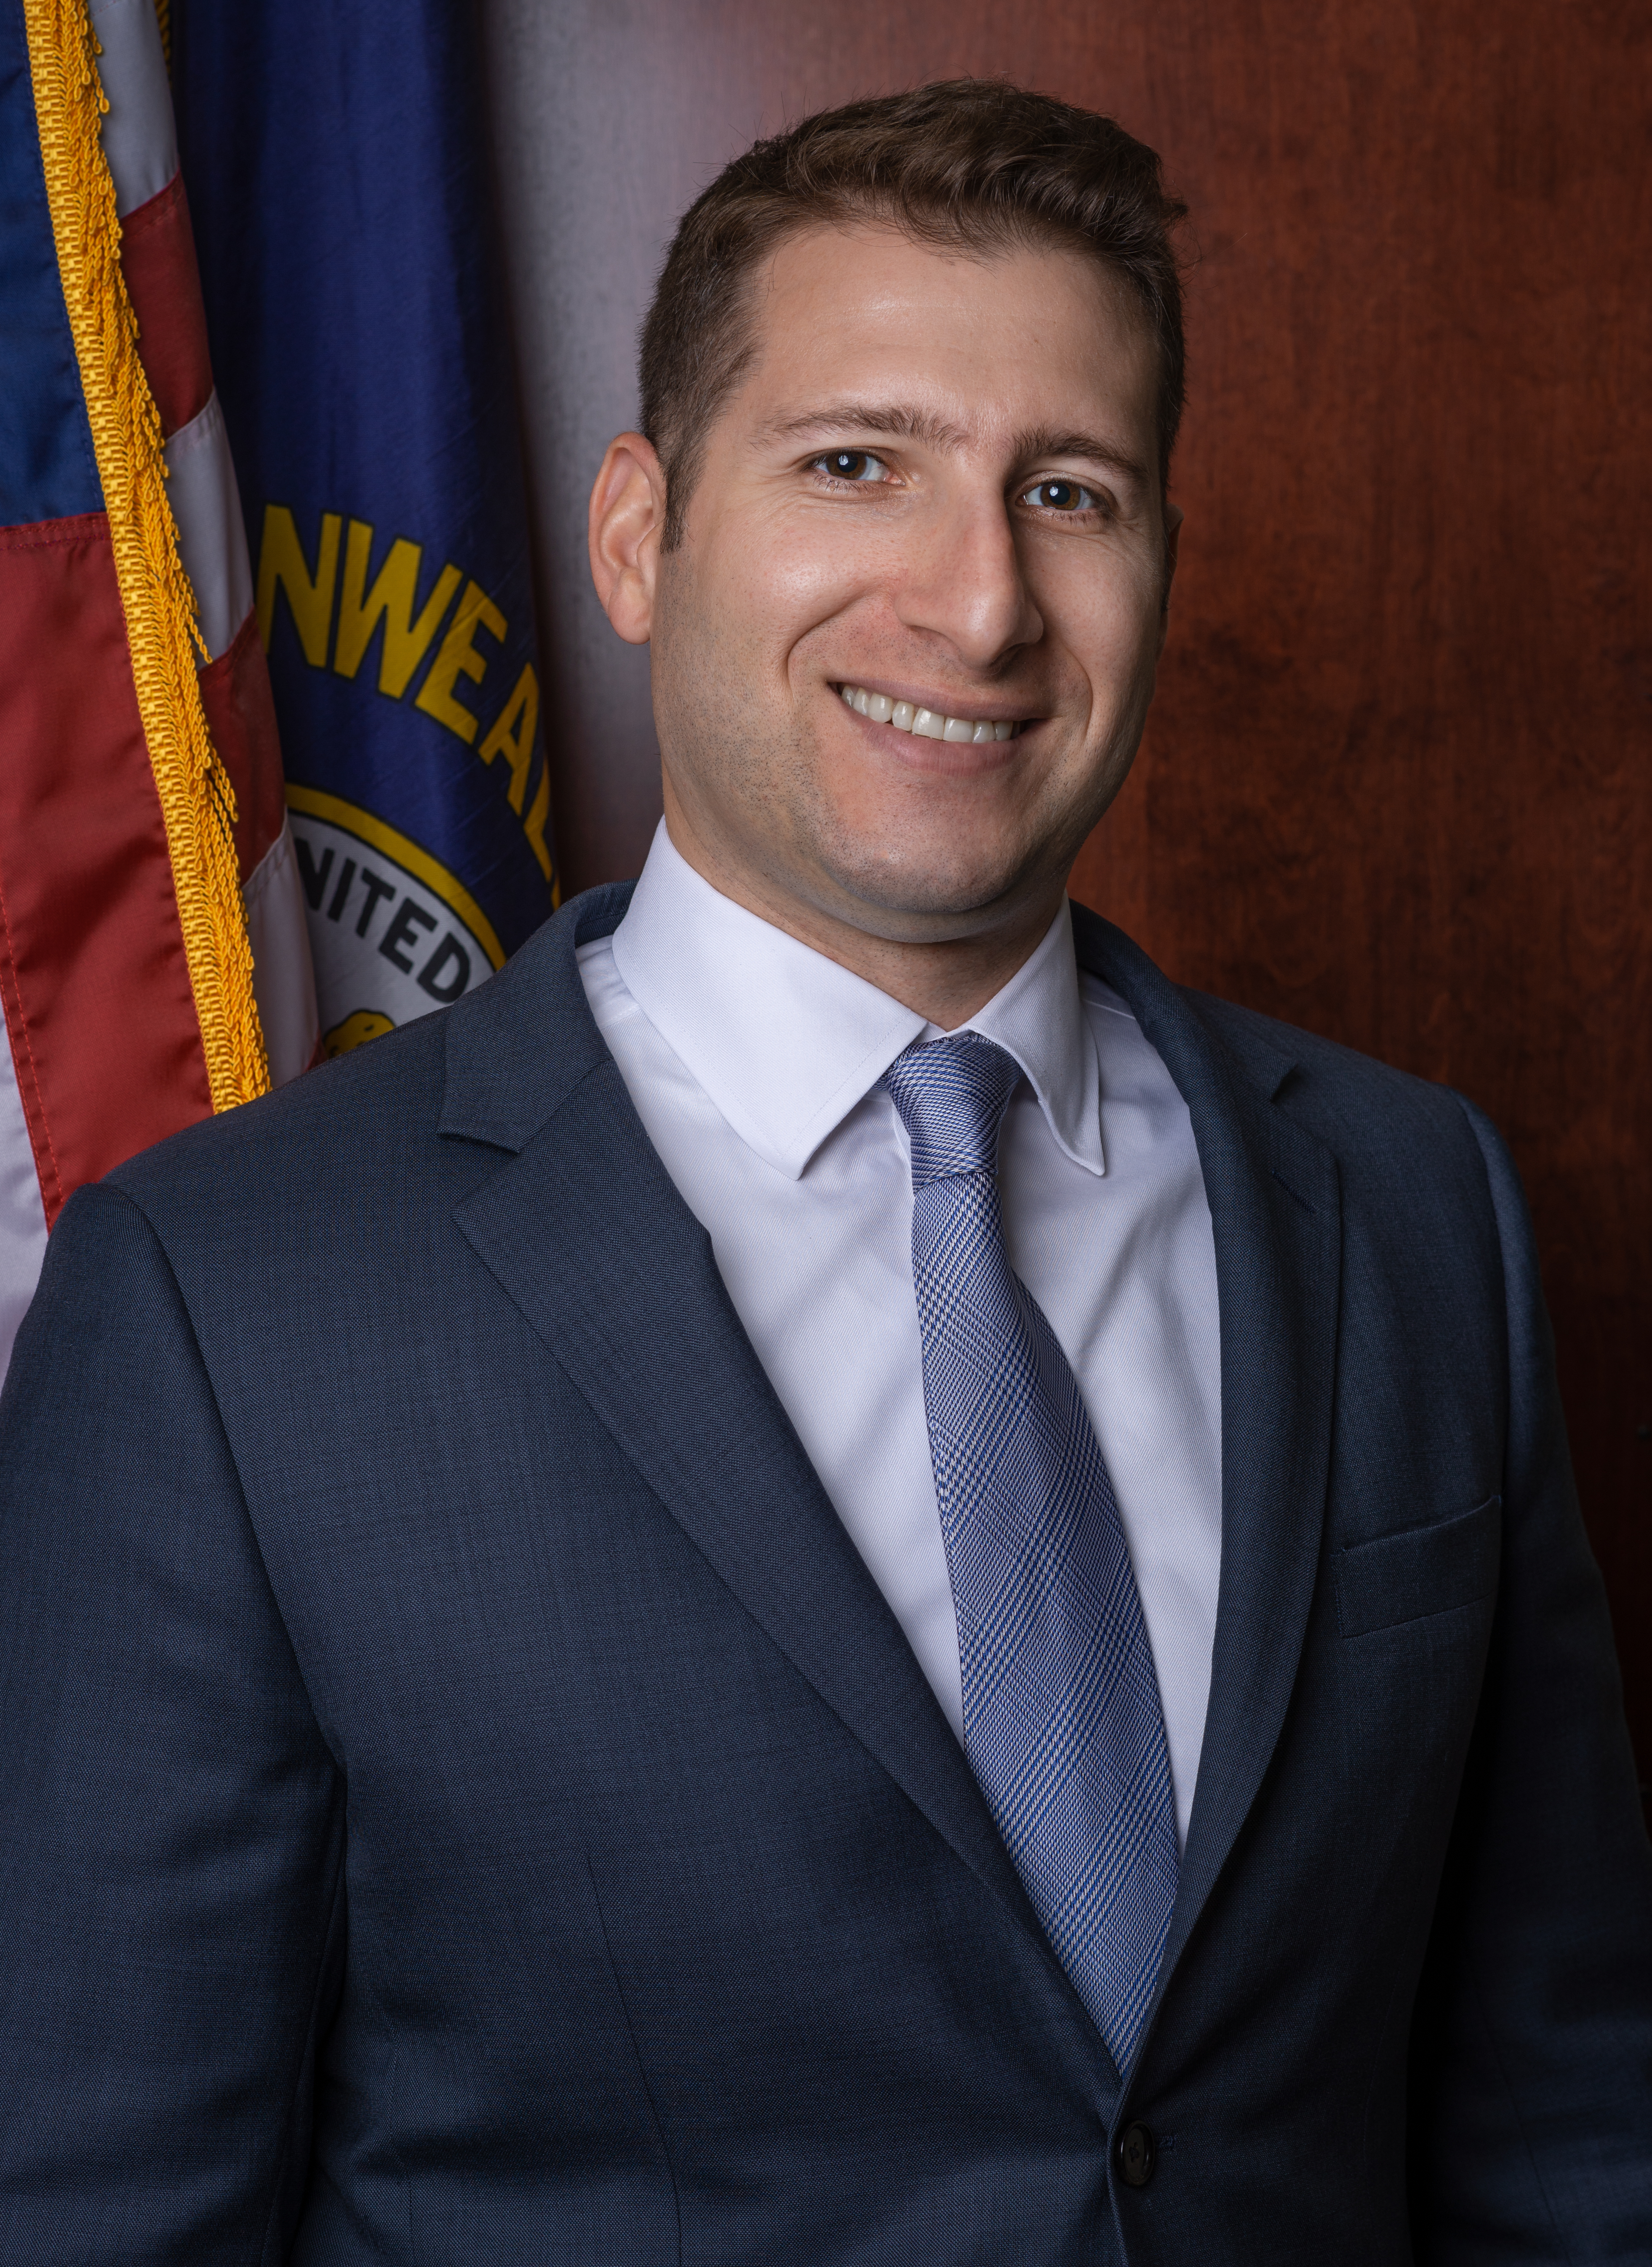 Aaron Levinson